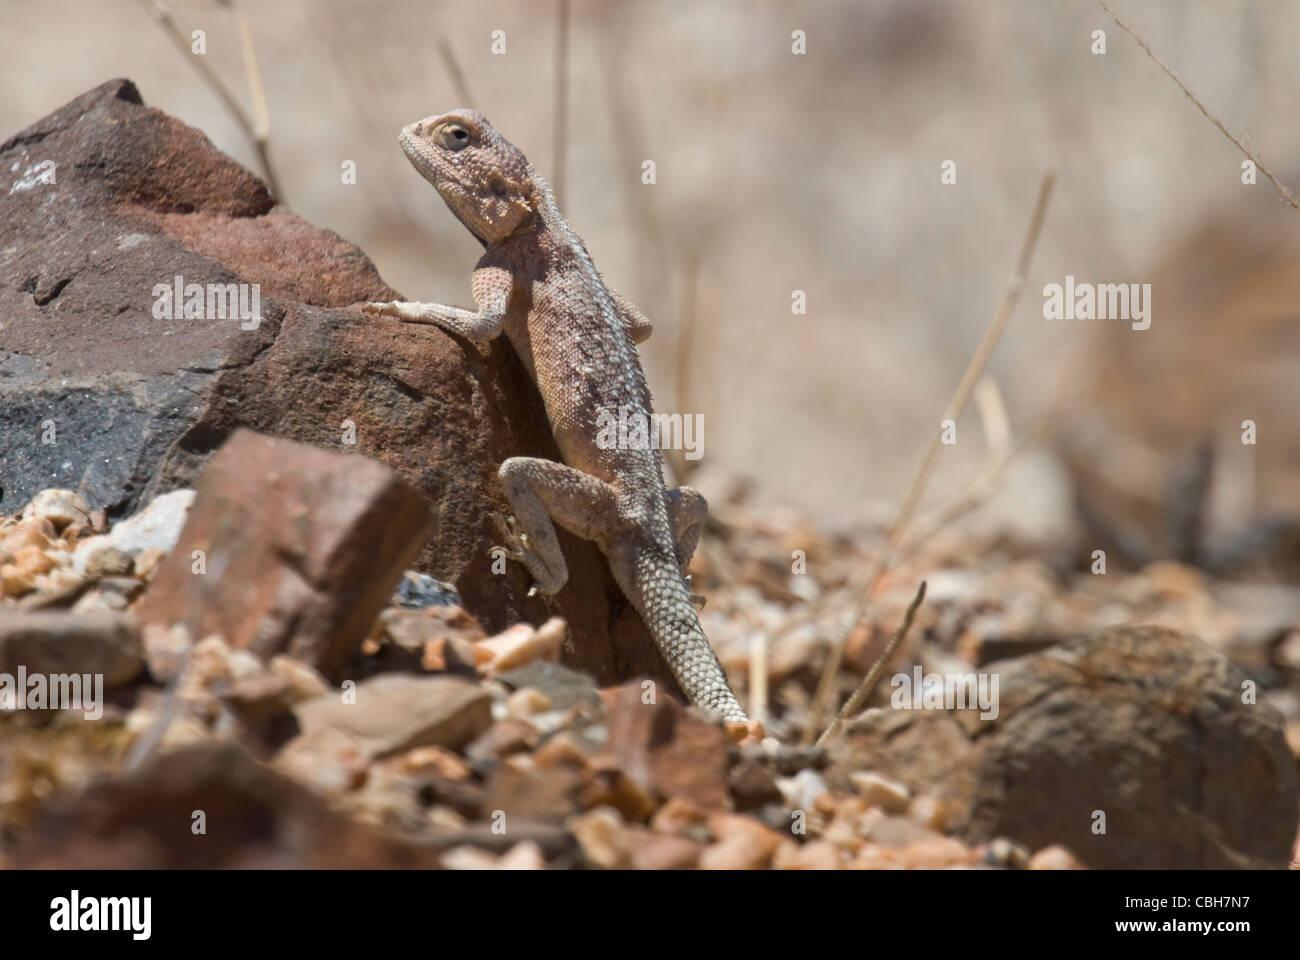 Bushveld Agama lizard climbing rock - Stock Image